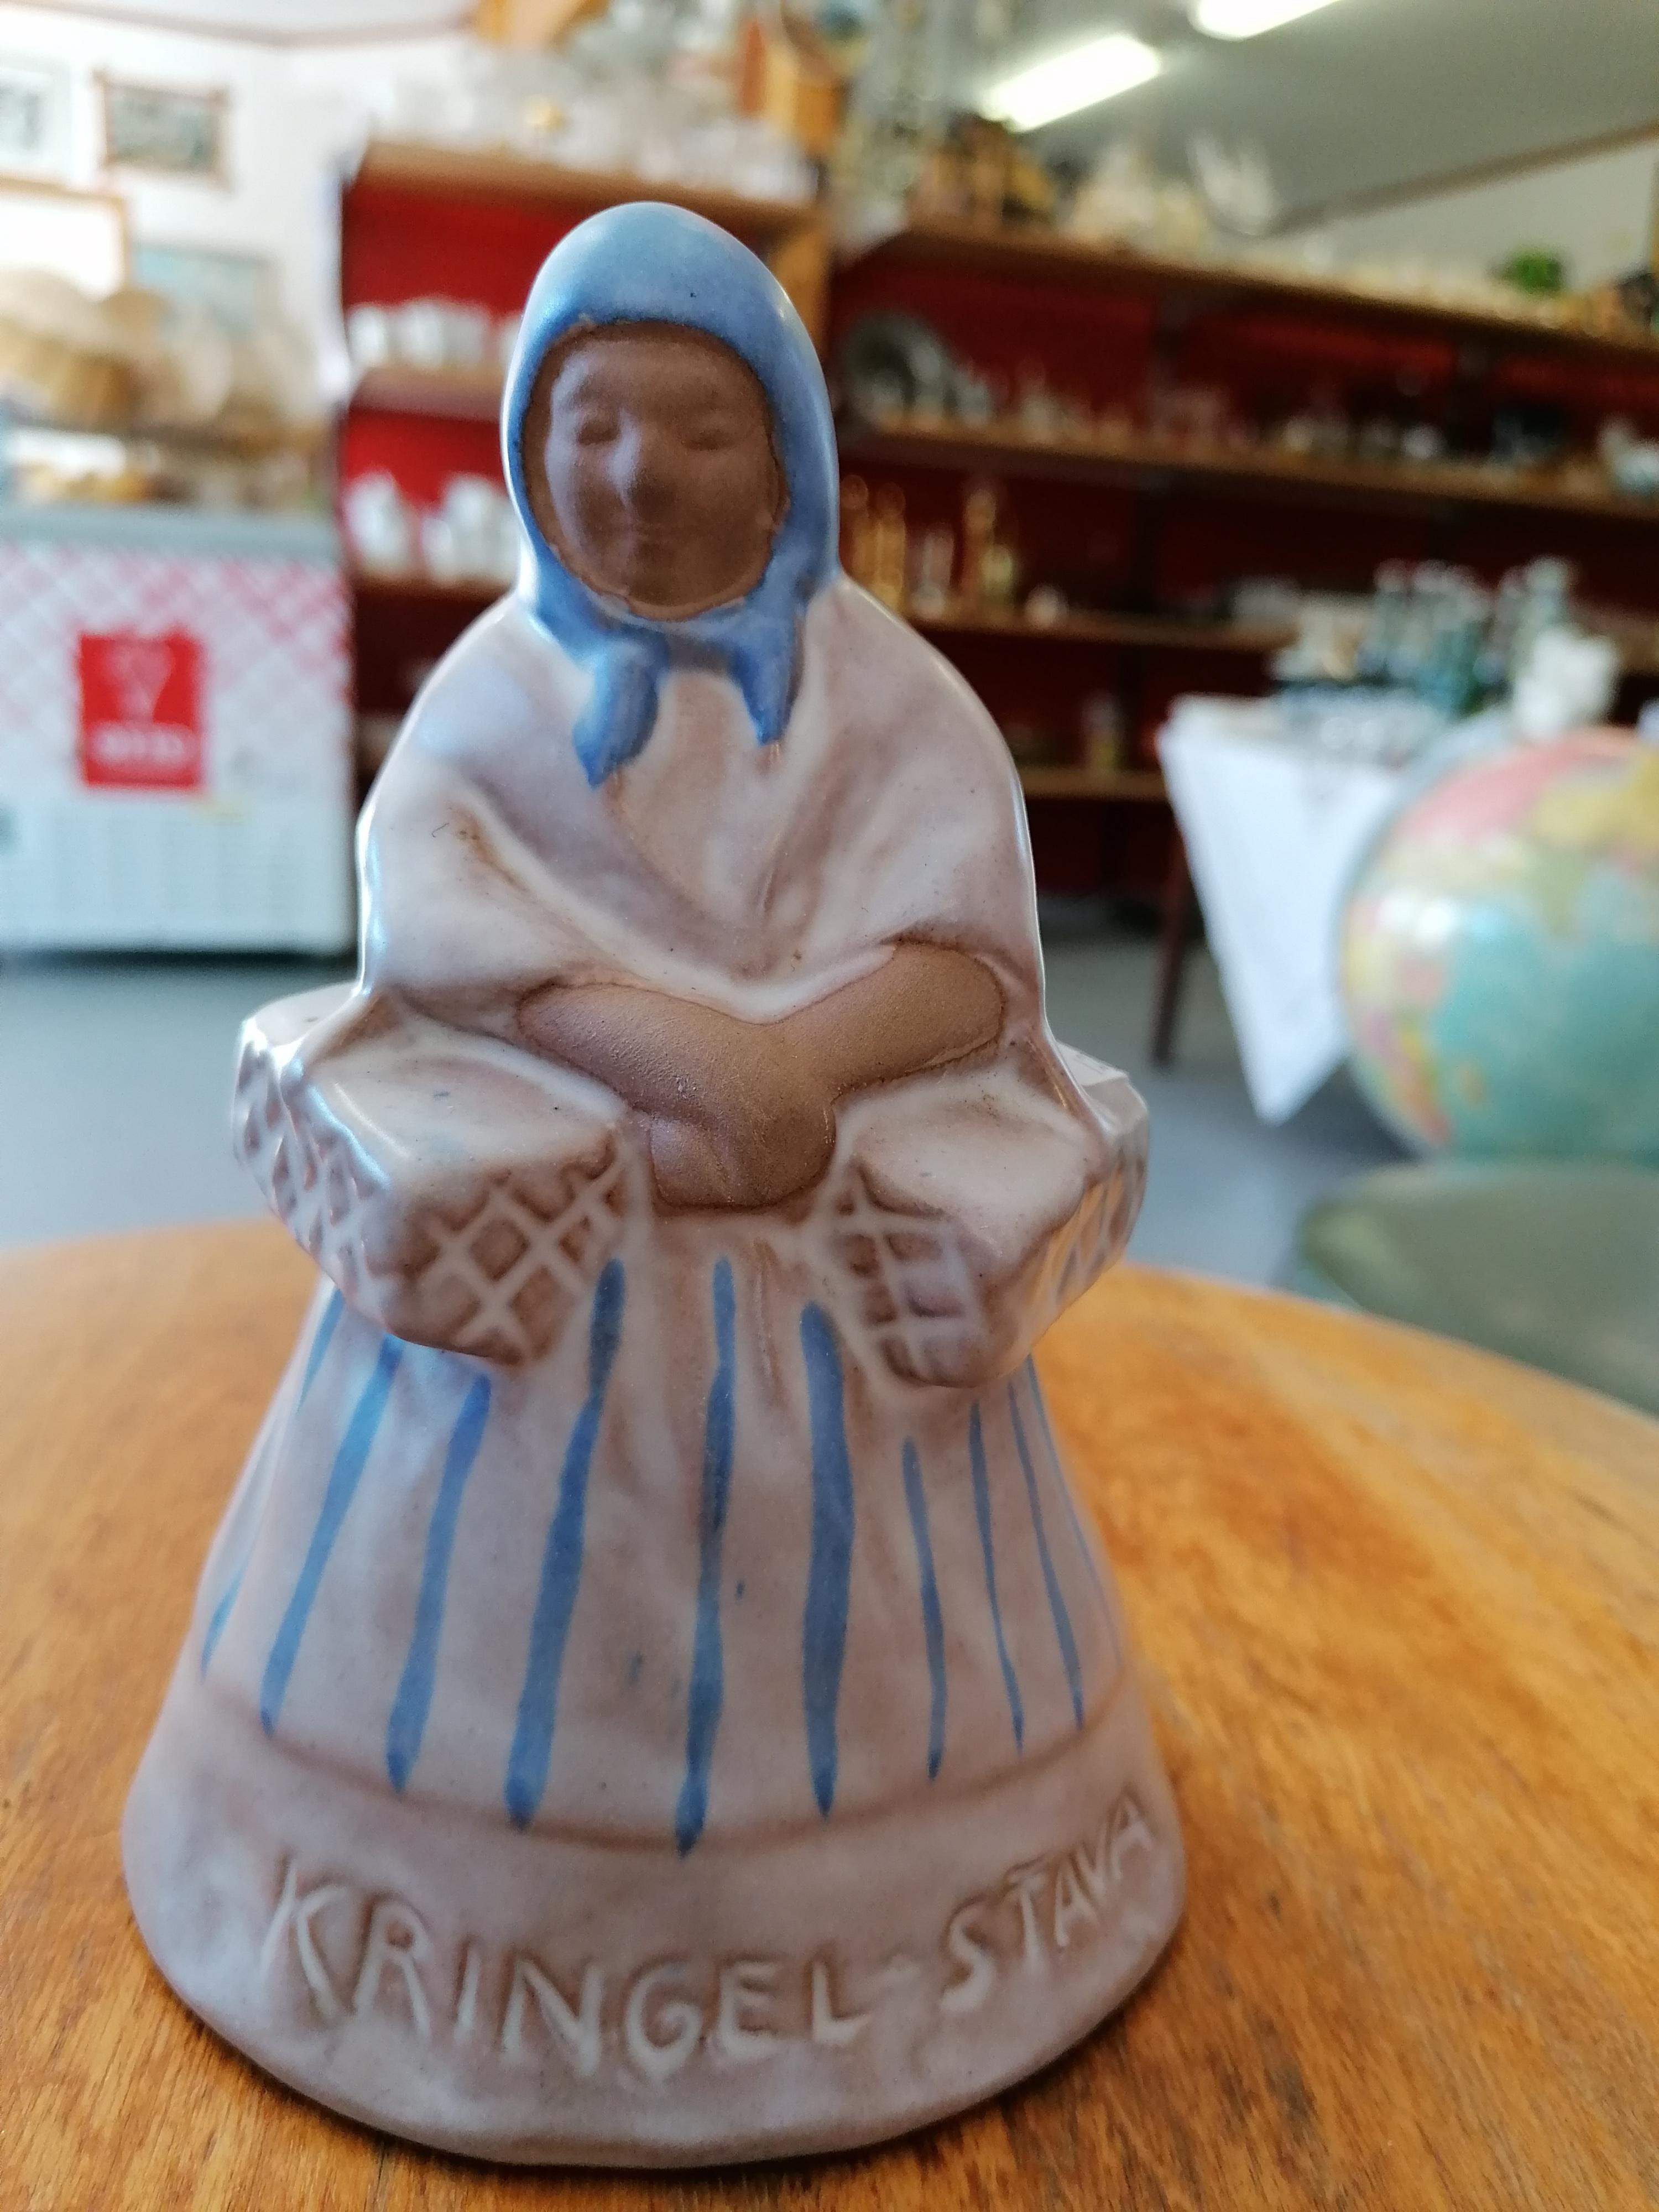 Kringel Stava Jie keramik